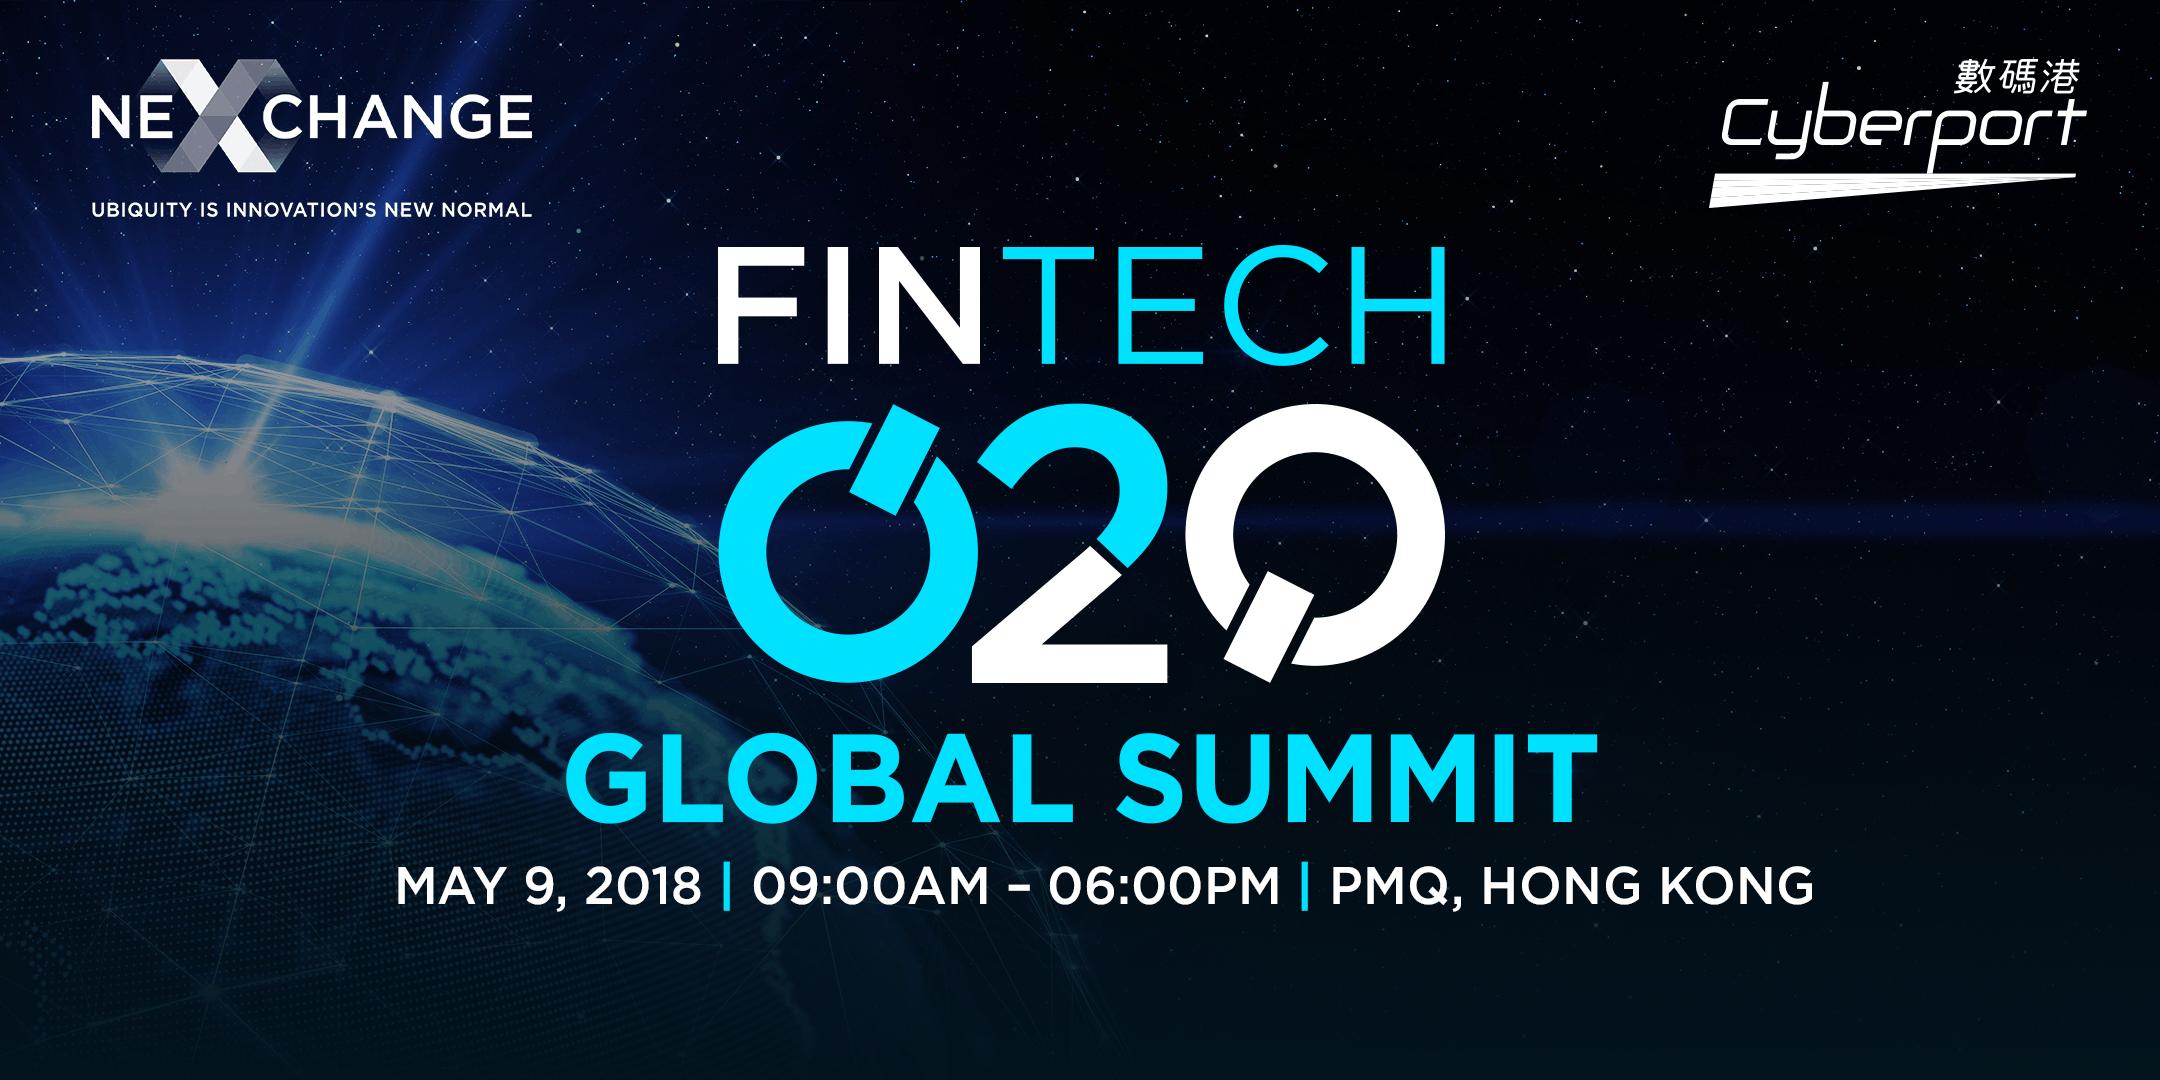 Fintech O2O: Global Summit 2018 (CPT Consider